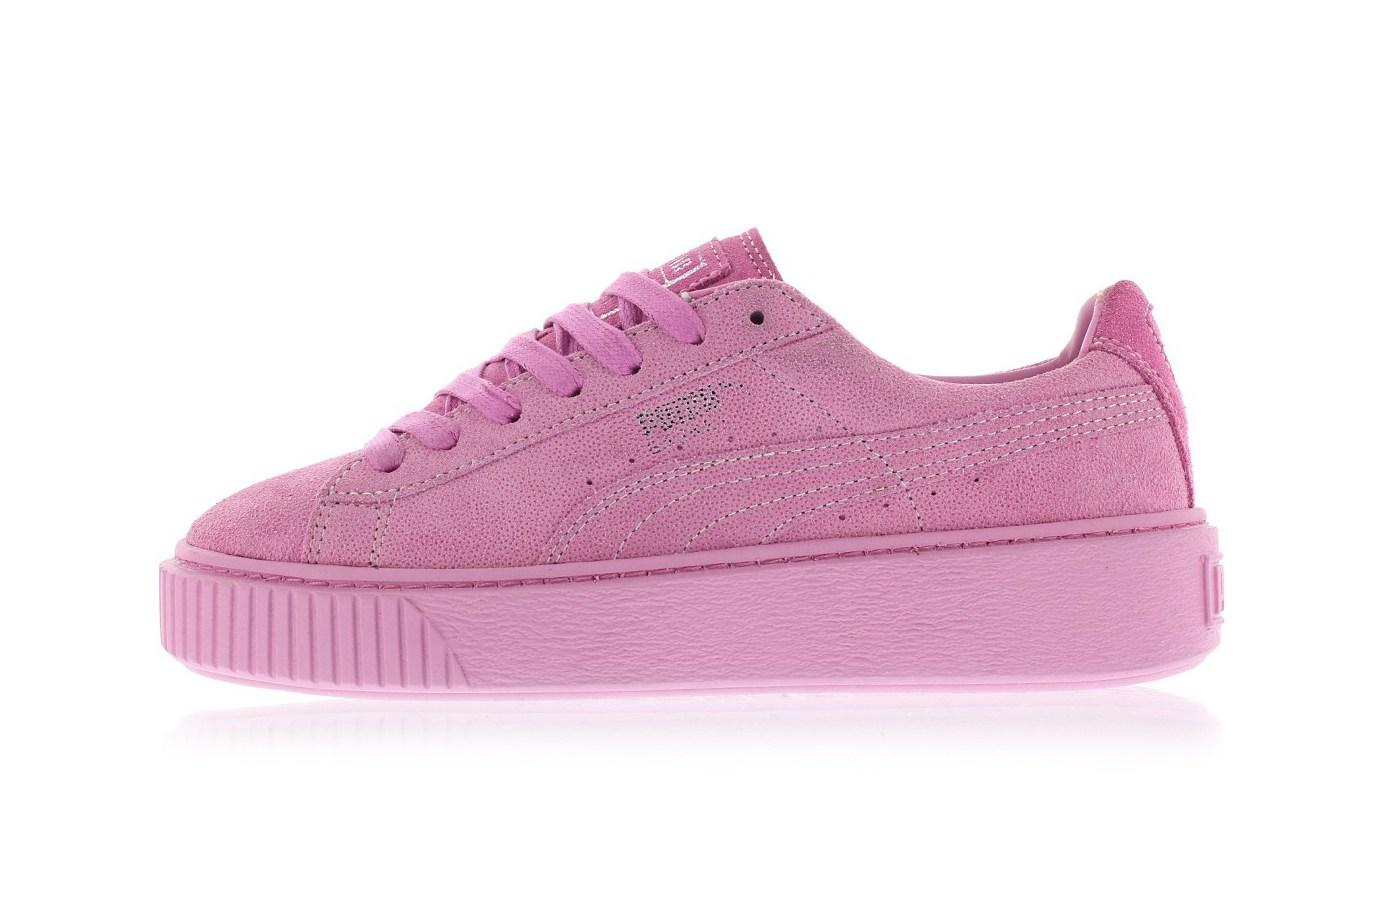 puma-basket-platform-reset-pink-gray-2